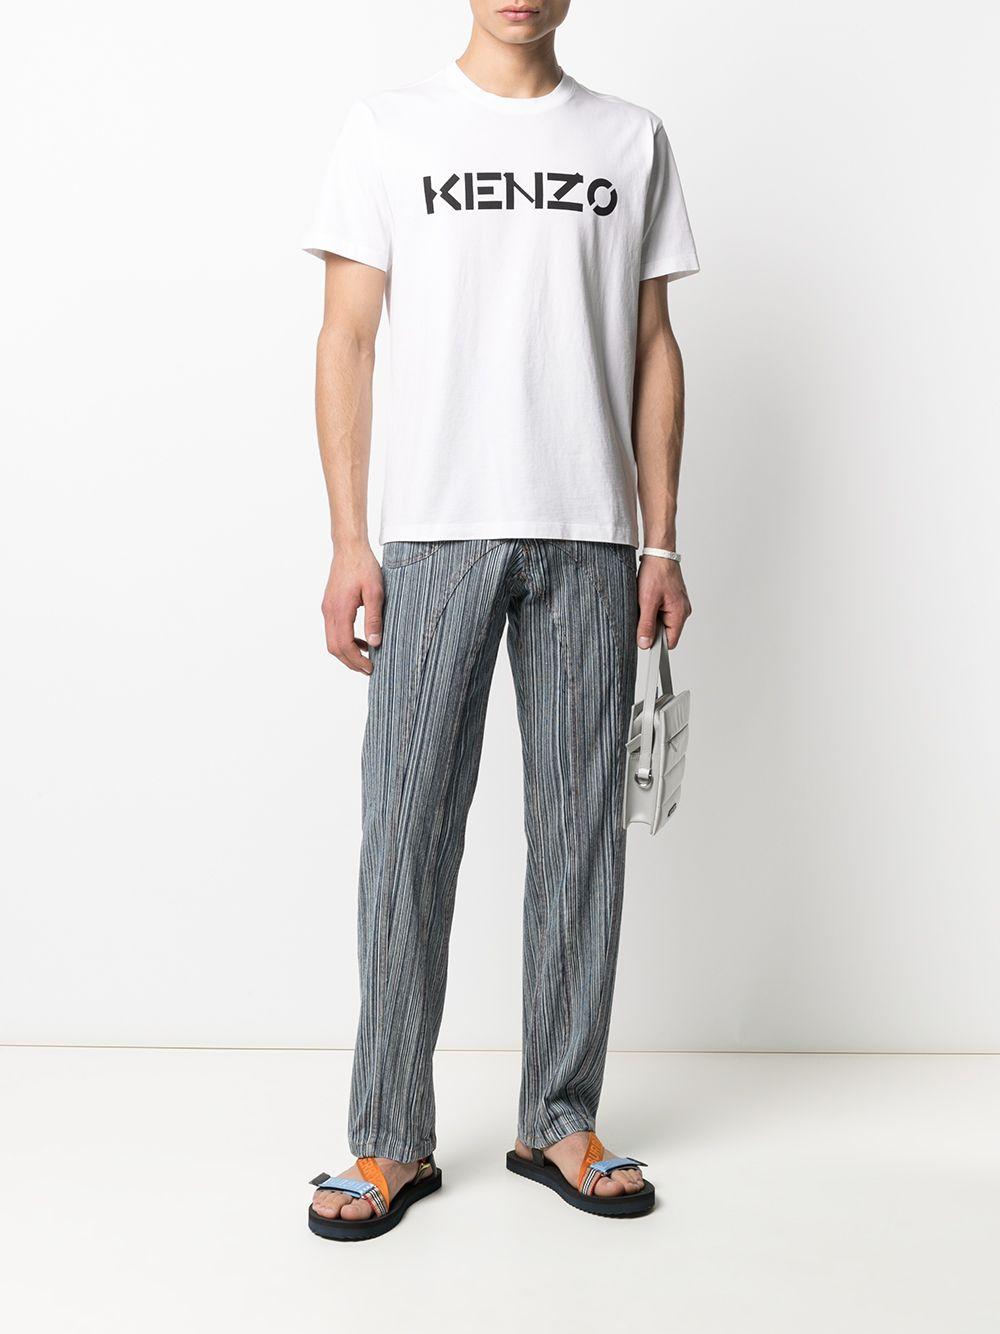 LOGO T-SHIRT KENZO | T-shirts | FA65TS0004SJ01B